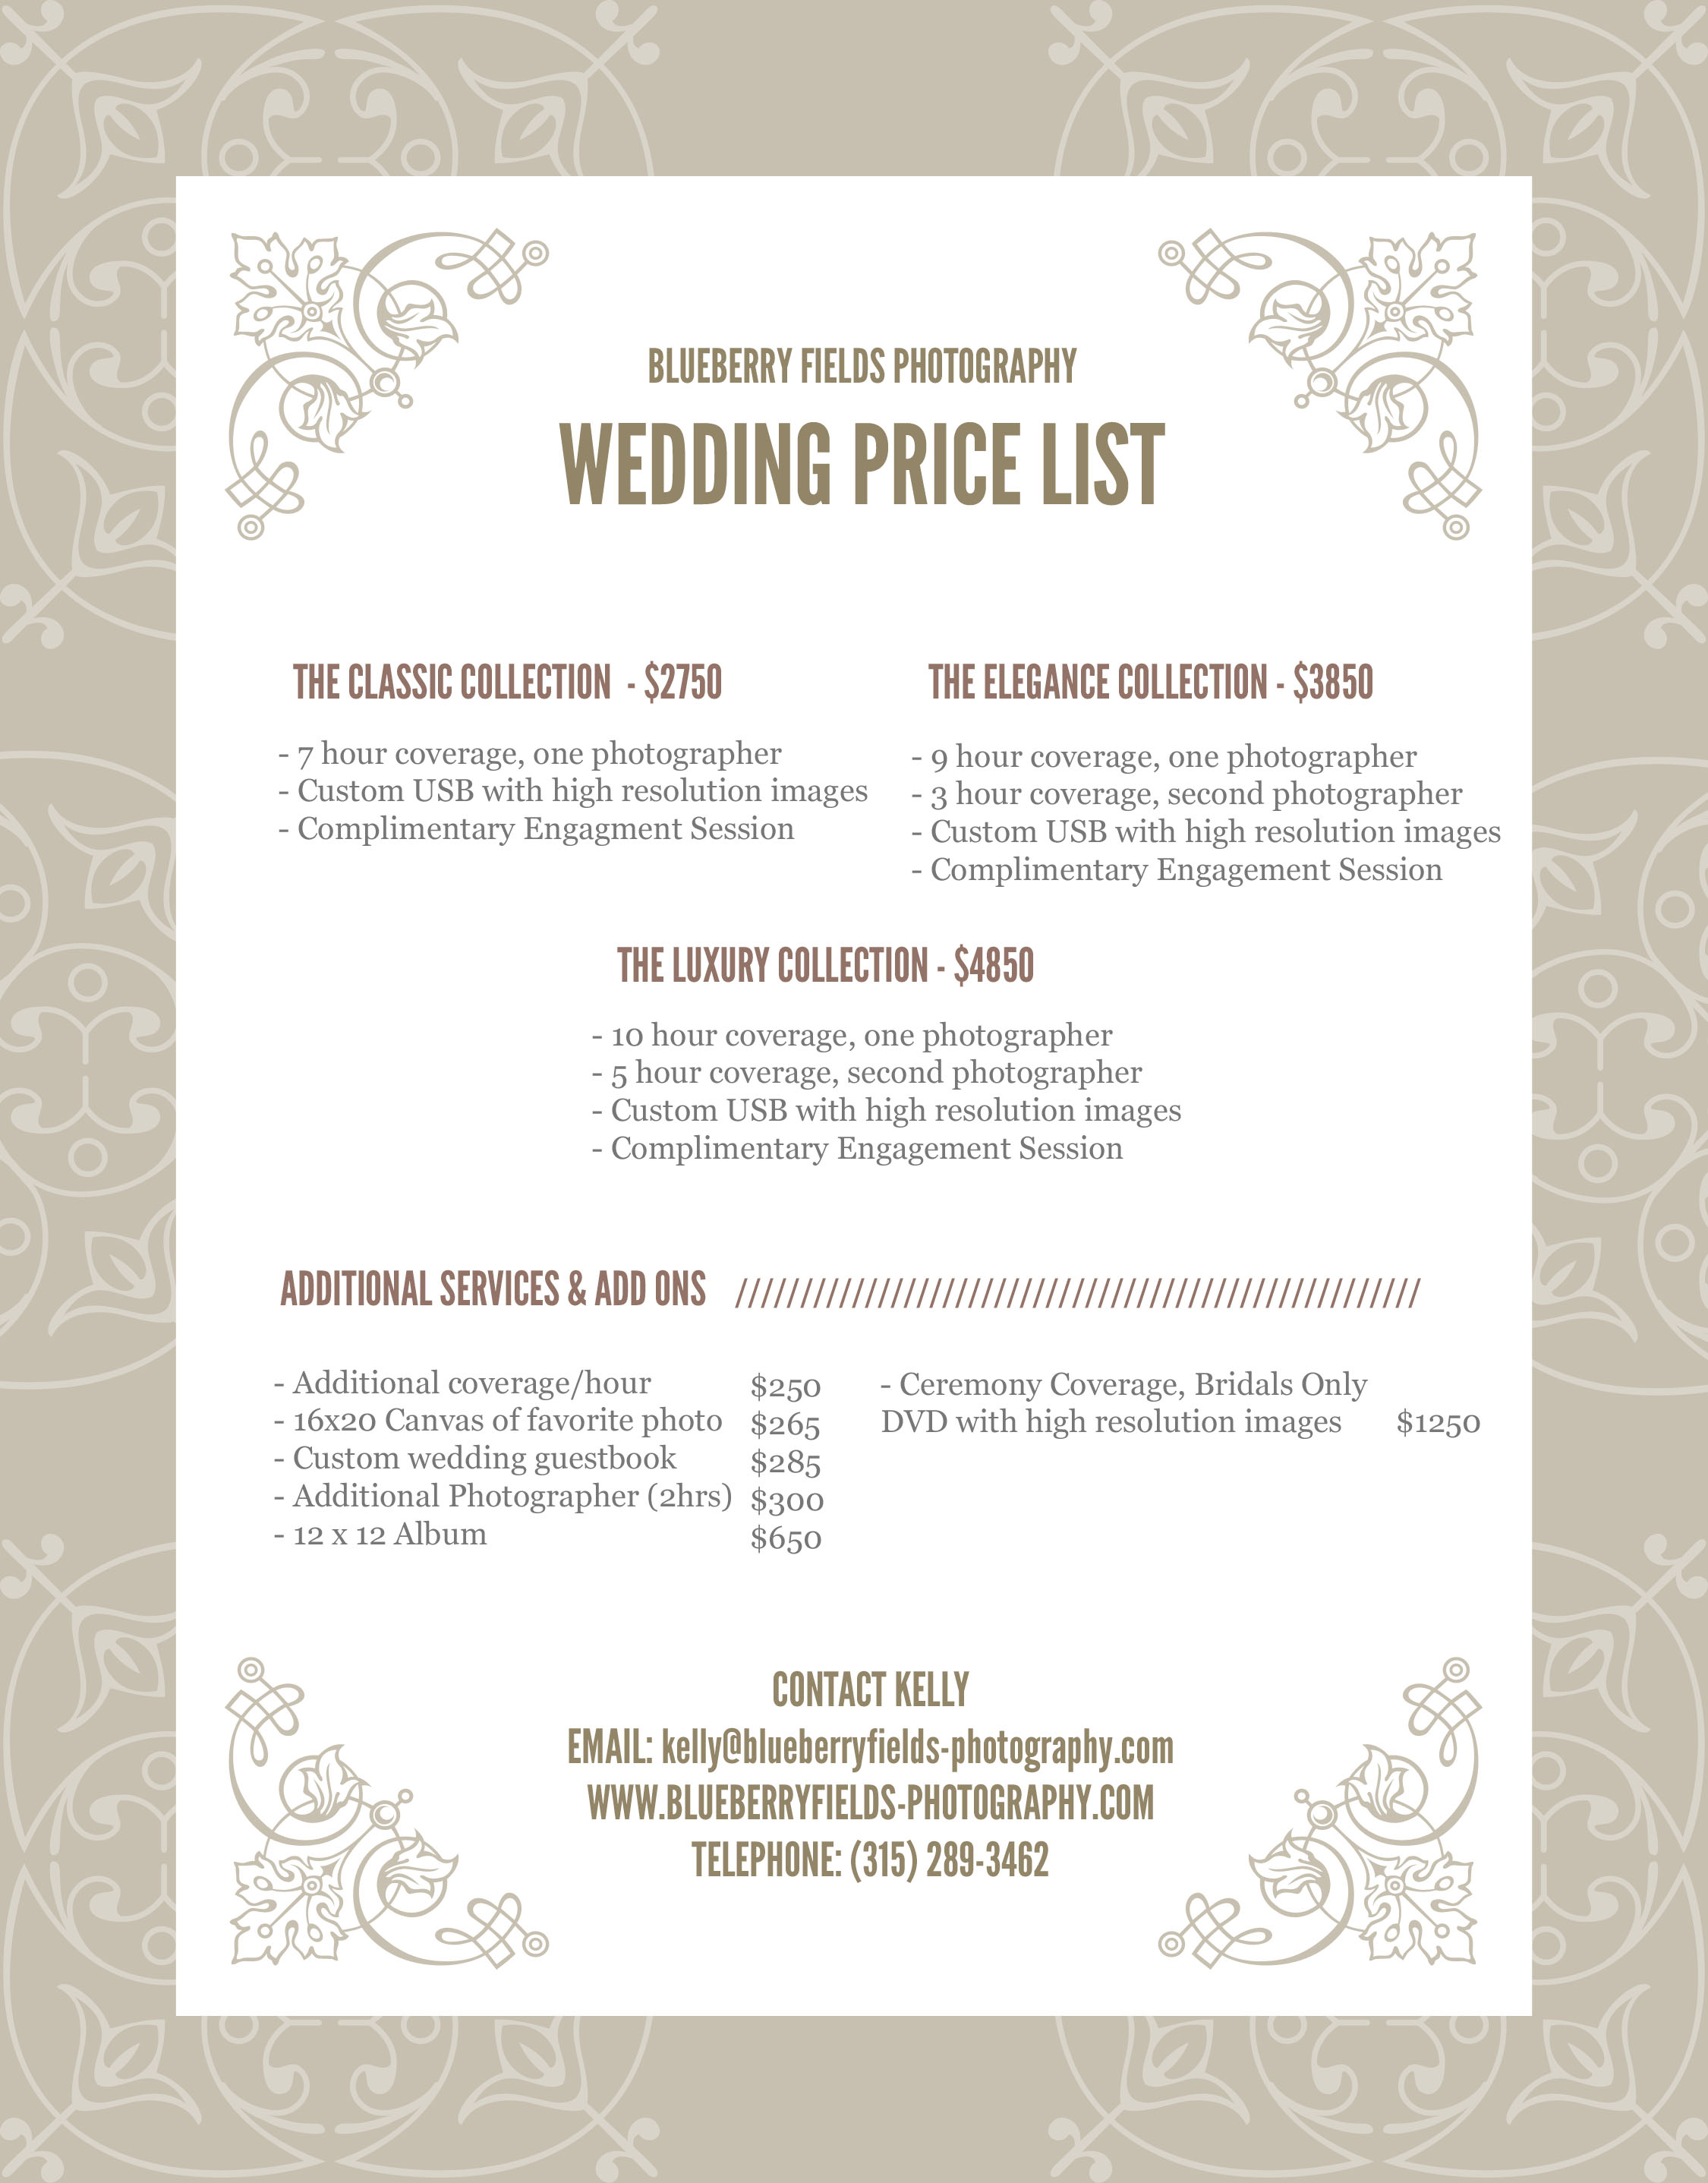 BFP Wedding Price Menu 2019.jpg